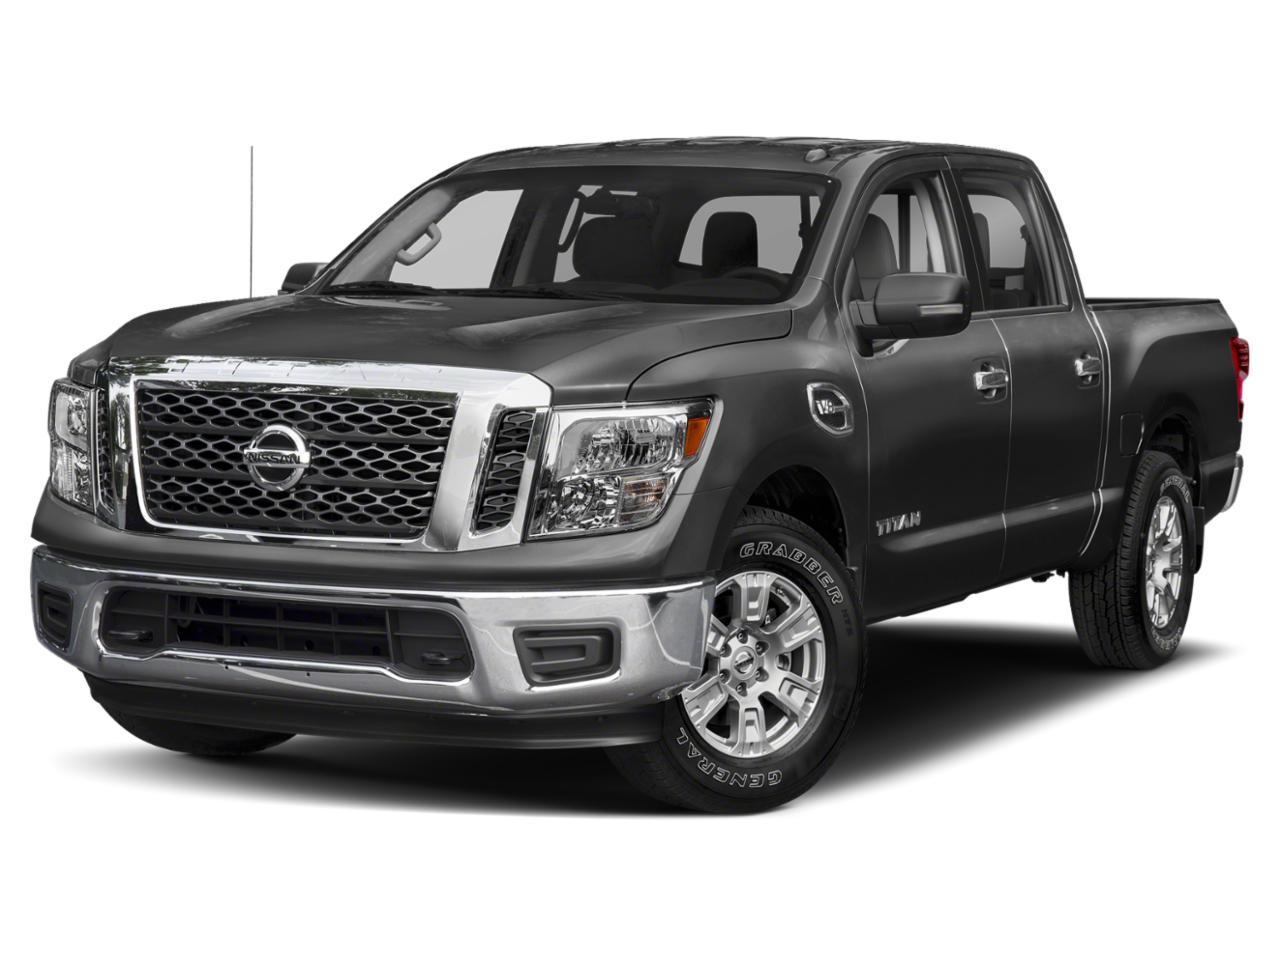 2019 Nissan Titan Vehicle Photo in San Antonio, TX 78209